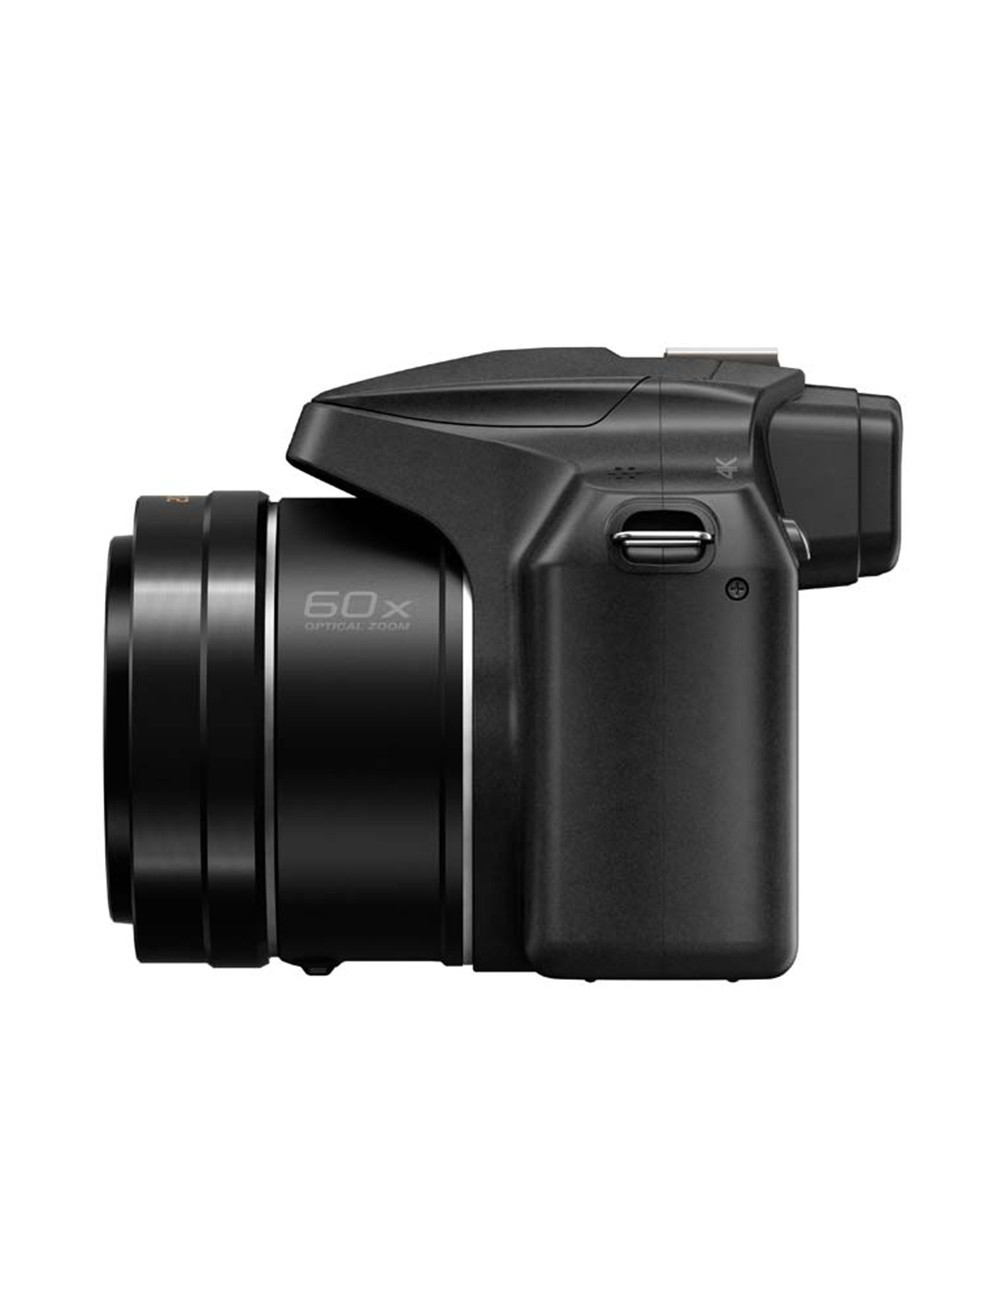 Fujifilm XF 50-140mm f/2.8 R LM OIS WR - Teleobjetivo Zoom Muy versátil